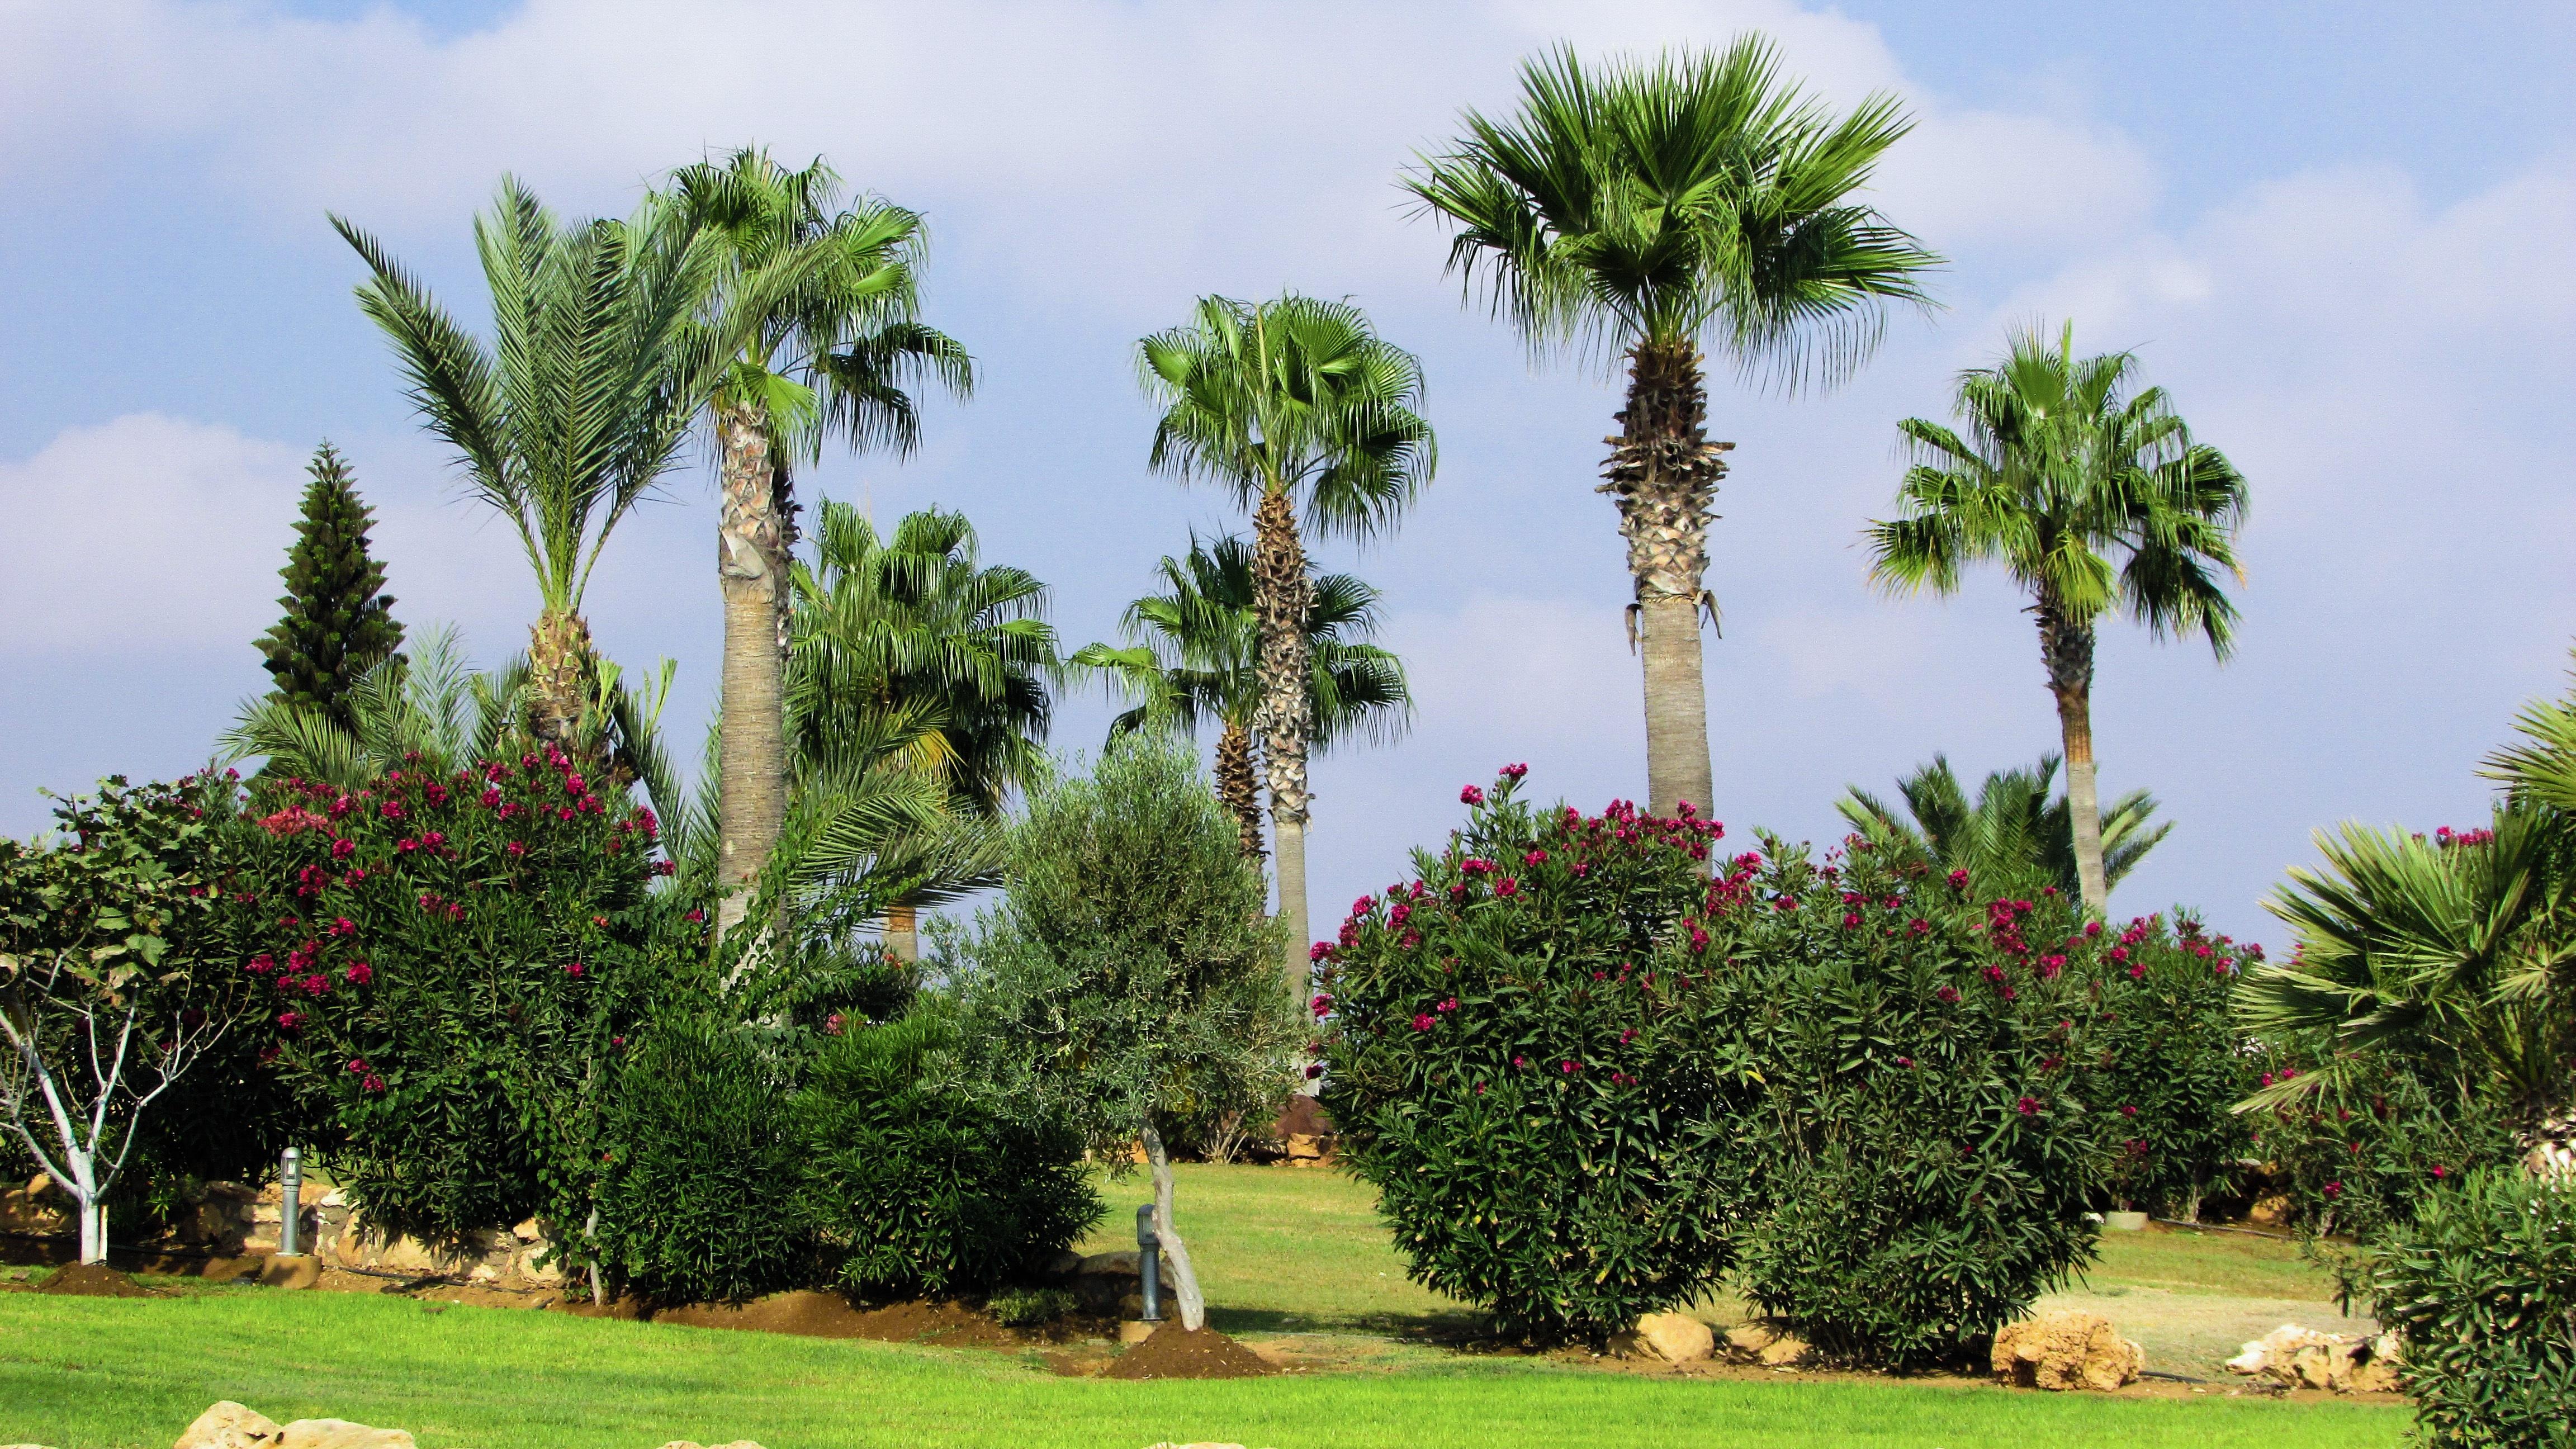 Fotos gratis rbol c sped planta flor verde for Arboles jardin botanico